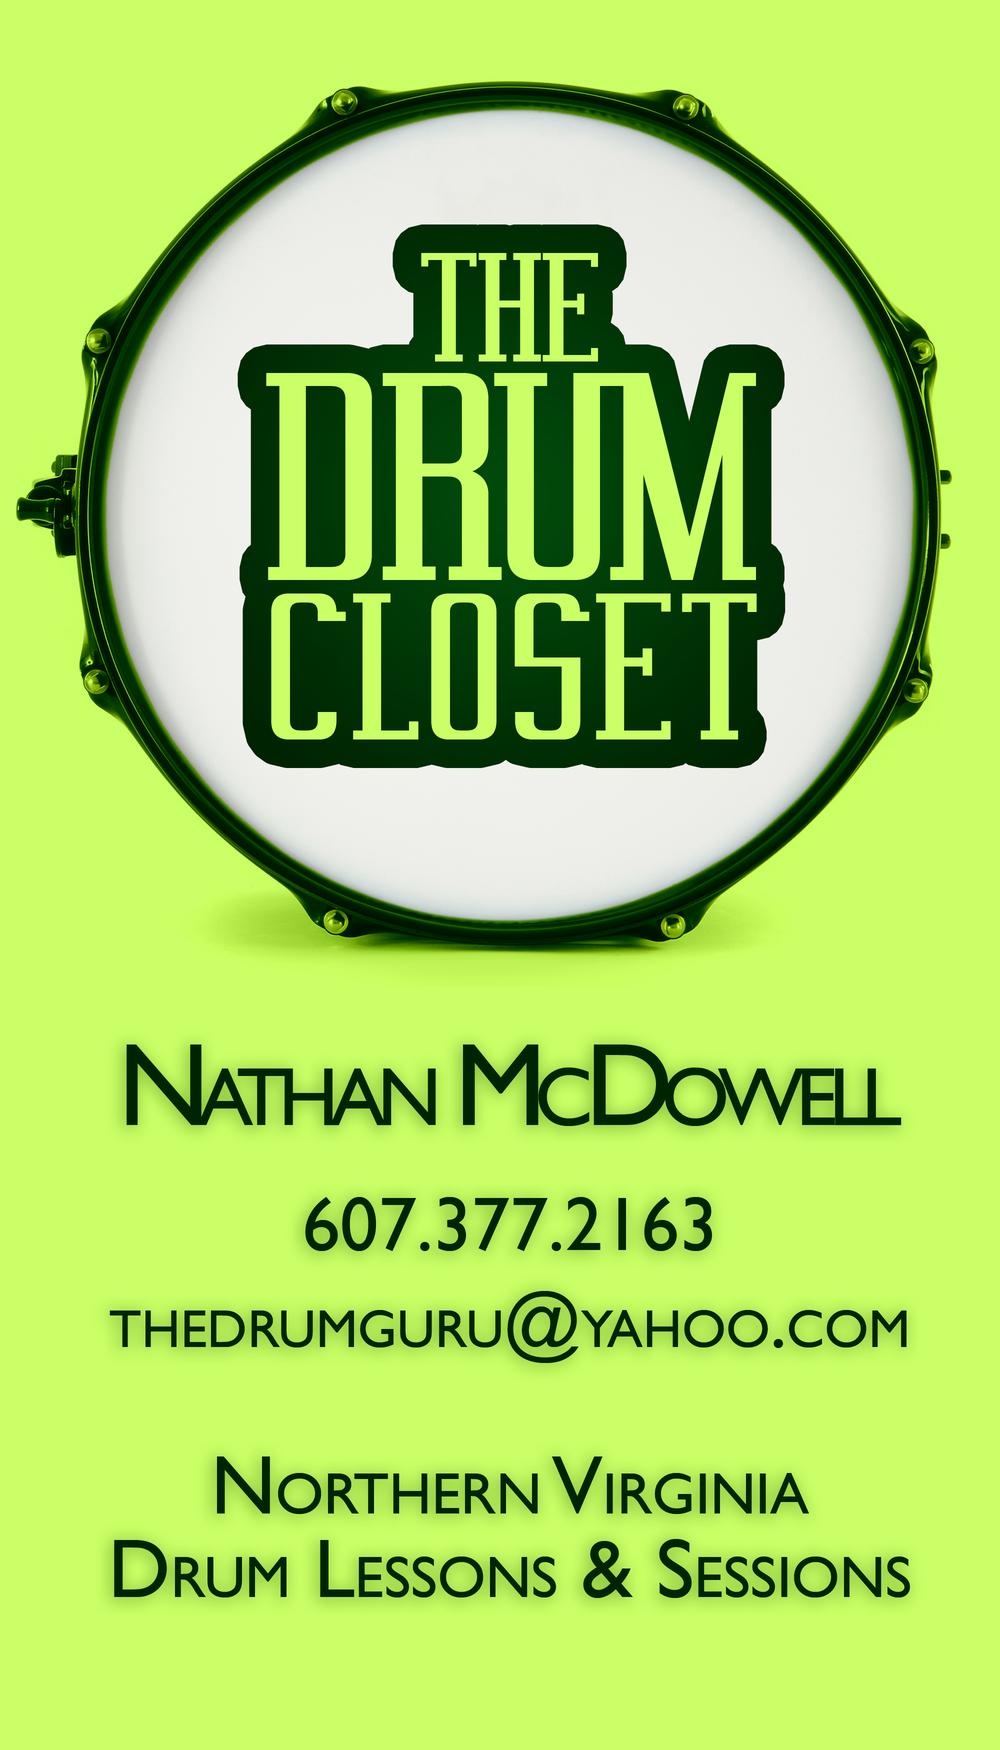 The Drum Closet - Business Card